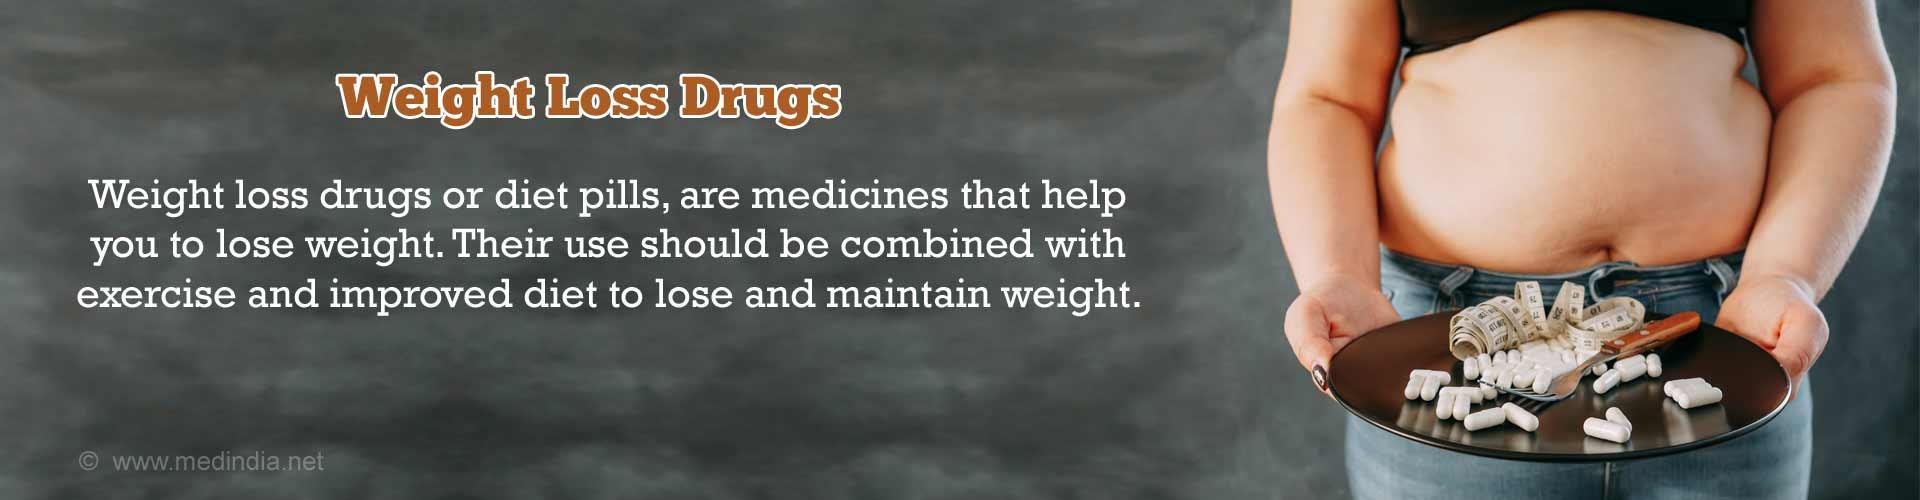 Weight Loss Drugs (Diet Pills)